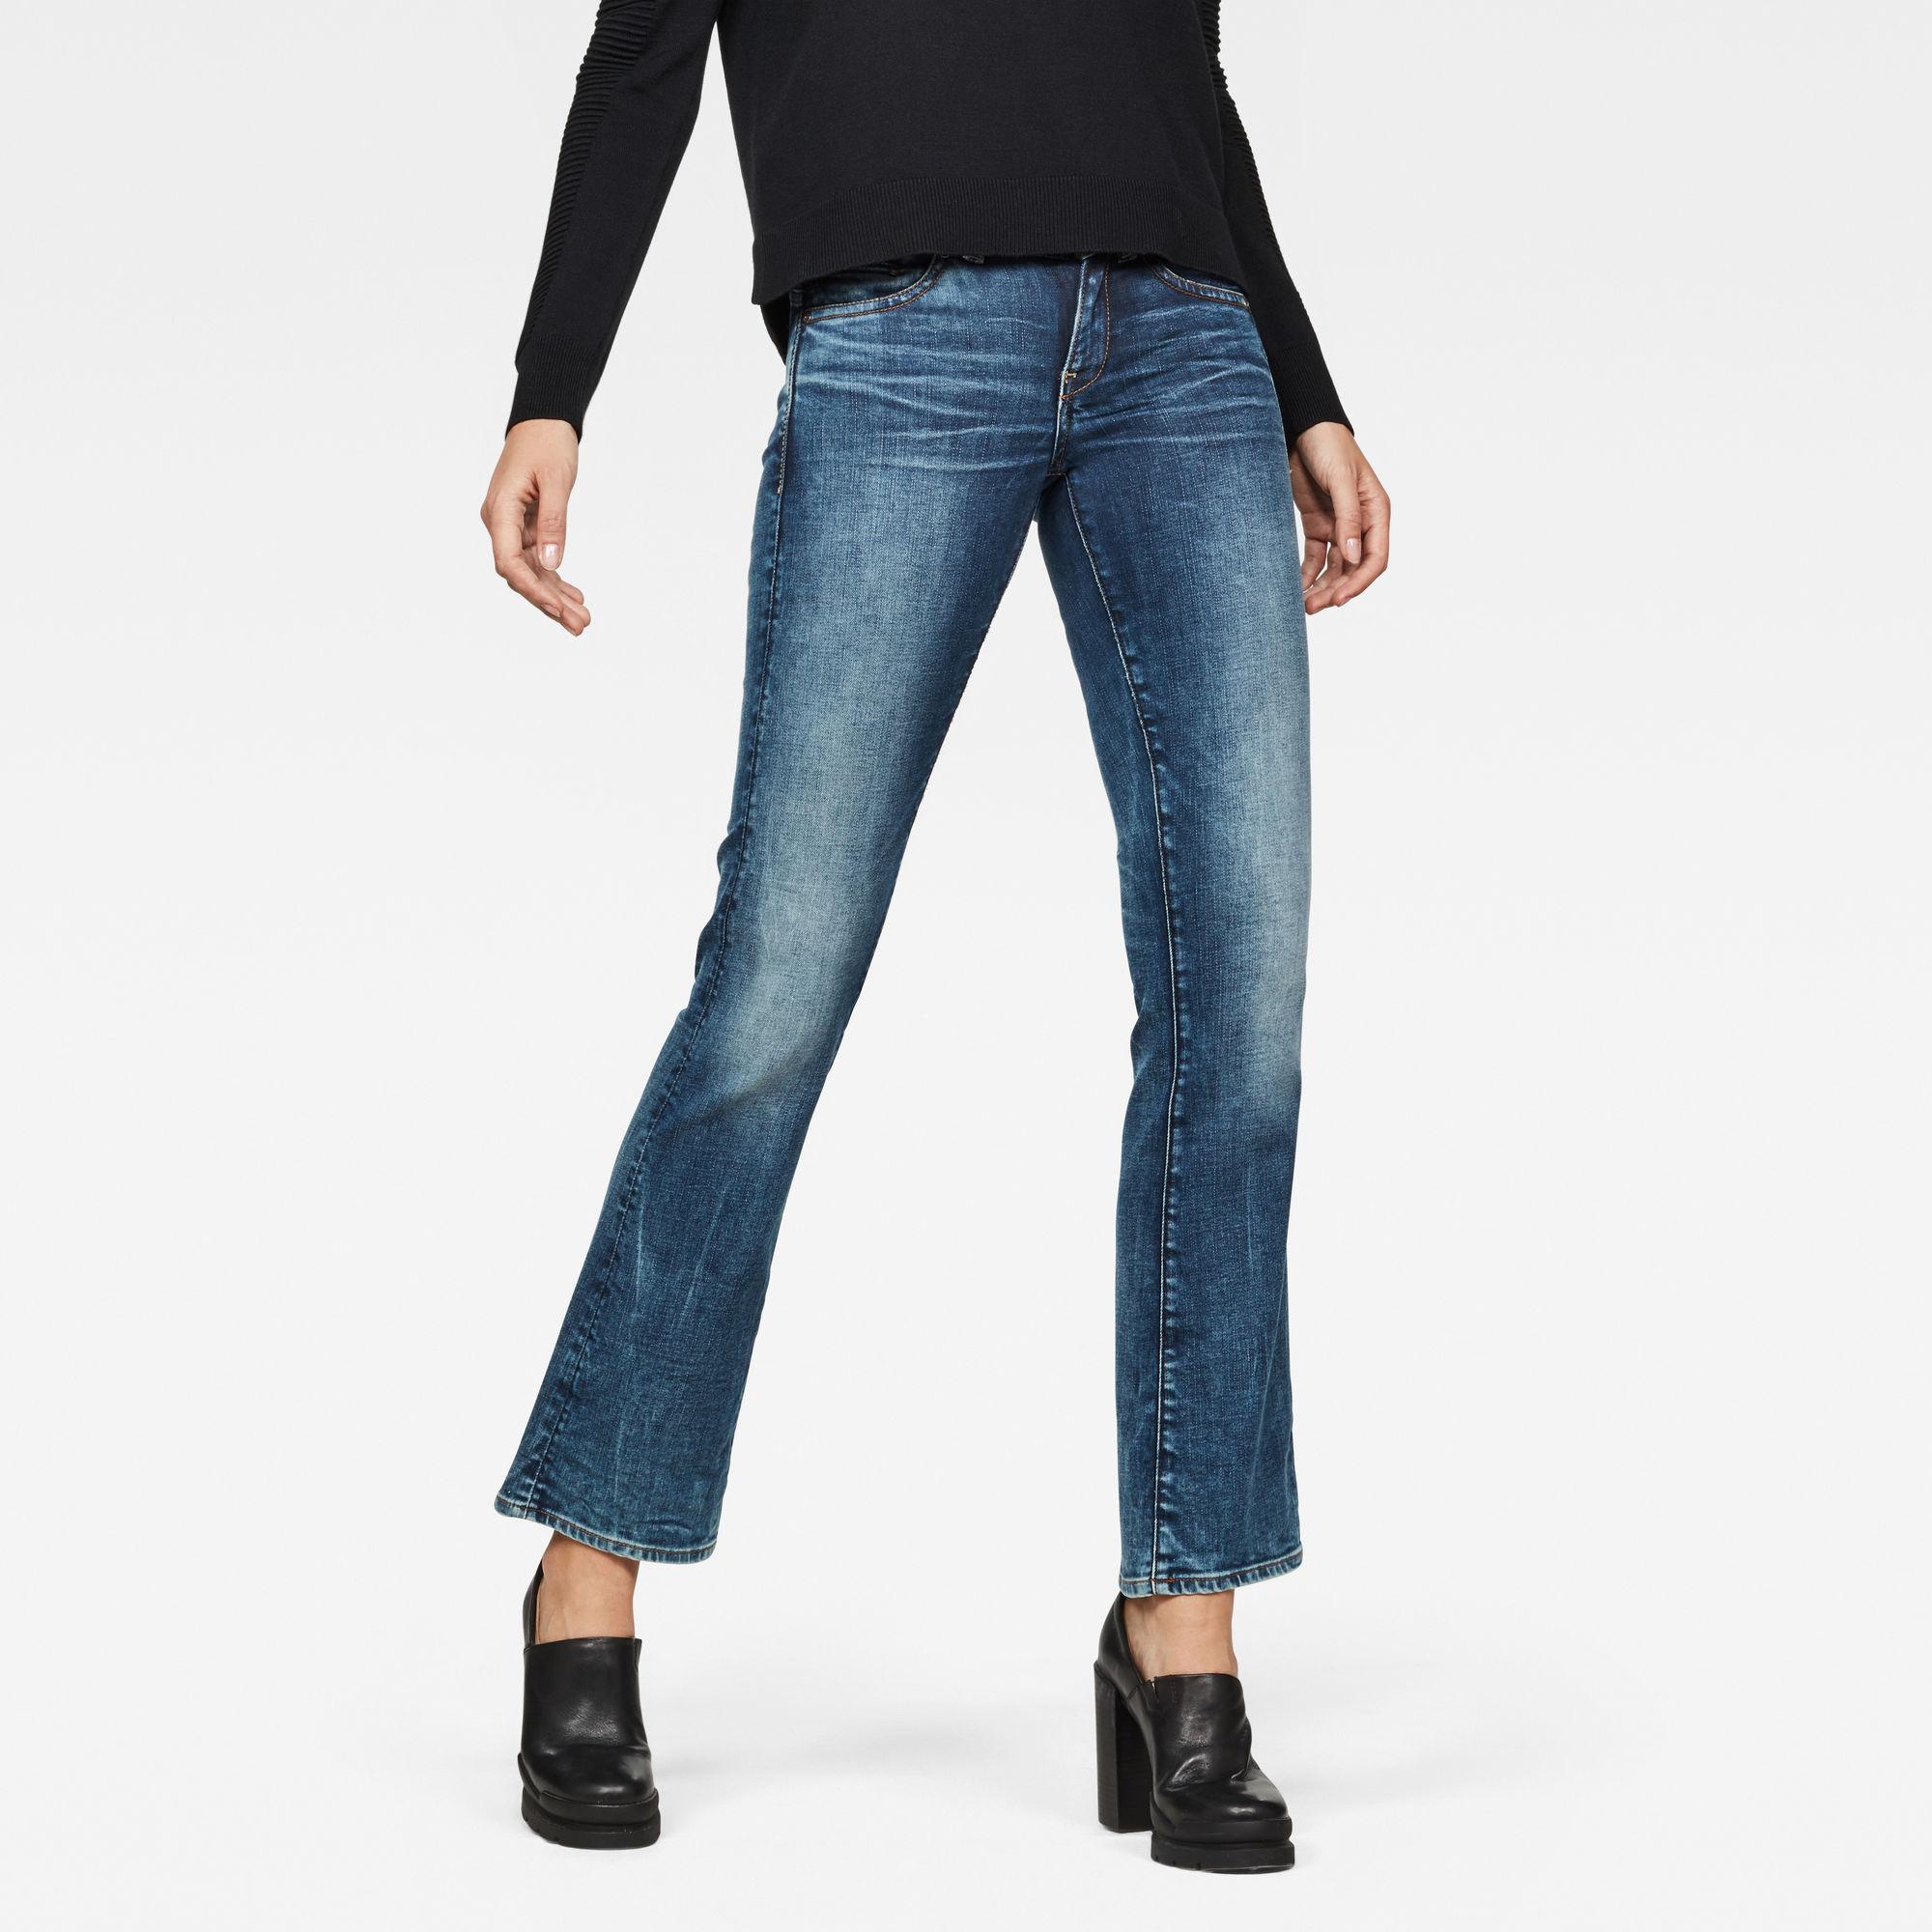 Midge Saddle Mid Waist Skinny Bootcut Jeans Jeans maat 32-32 van G-Star RAW snel en voordelig in huis? Hier lukt het direct